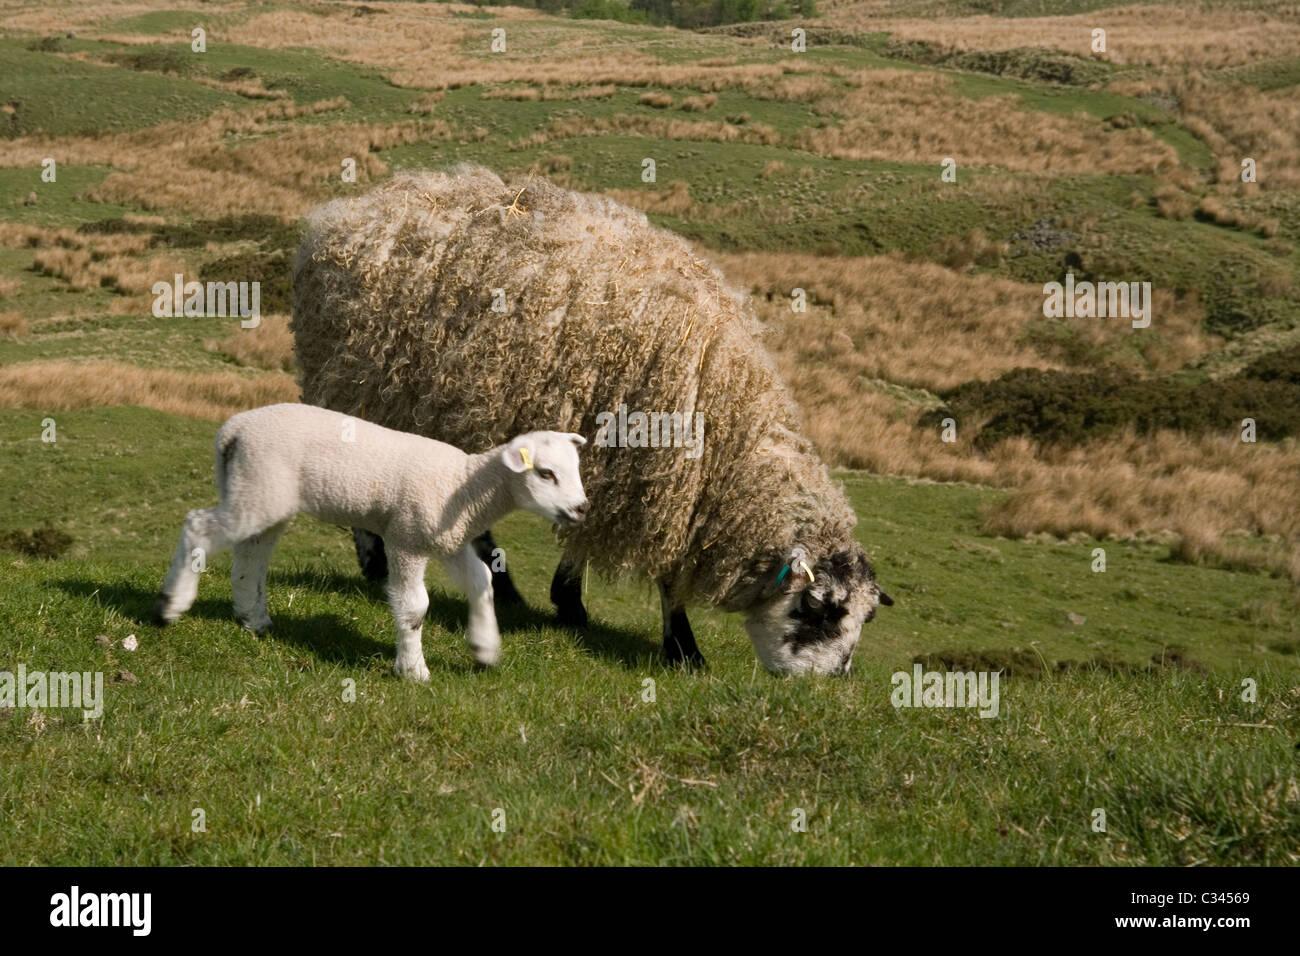 Sheep, ewe & lamb - Stock Image